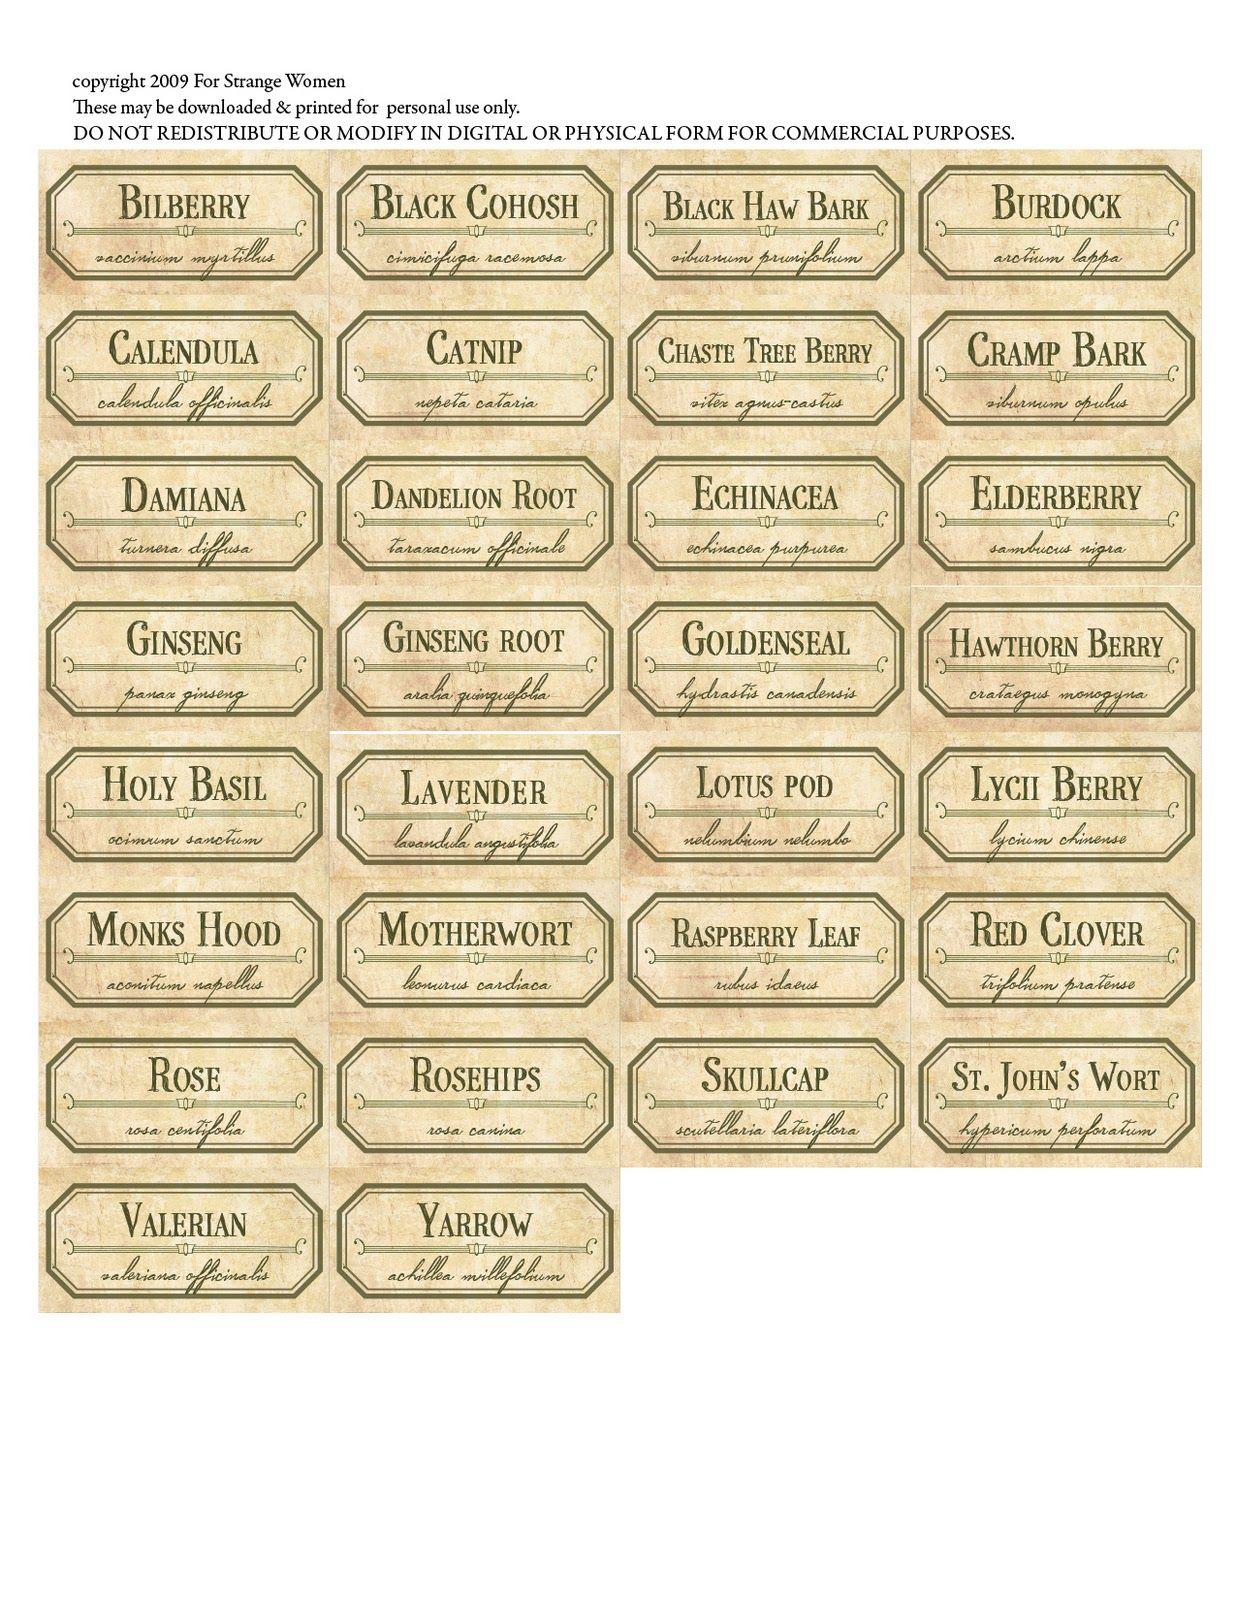 For Strange Women: Diy Spice Jar Labels - A Free Download To - Free Printable Herb Labels